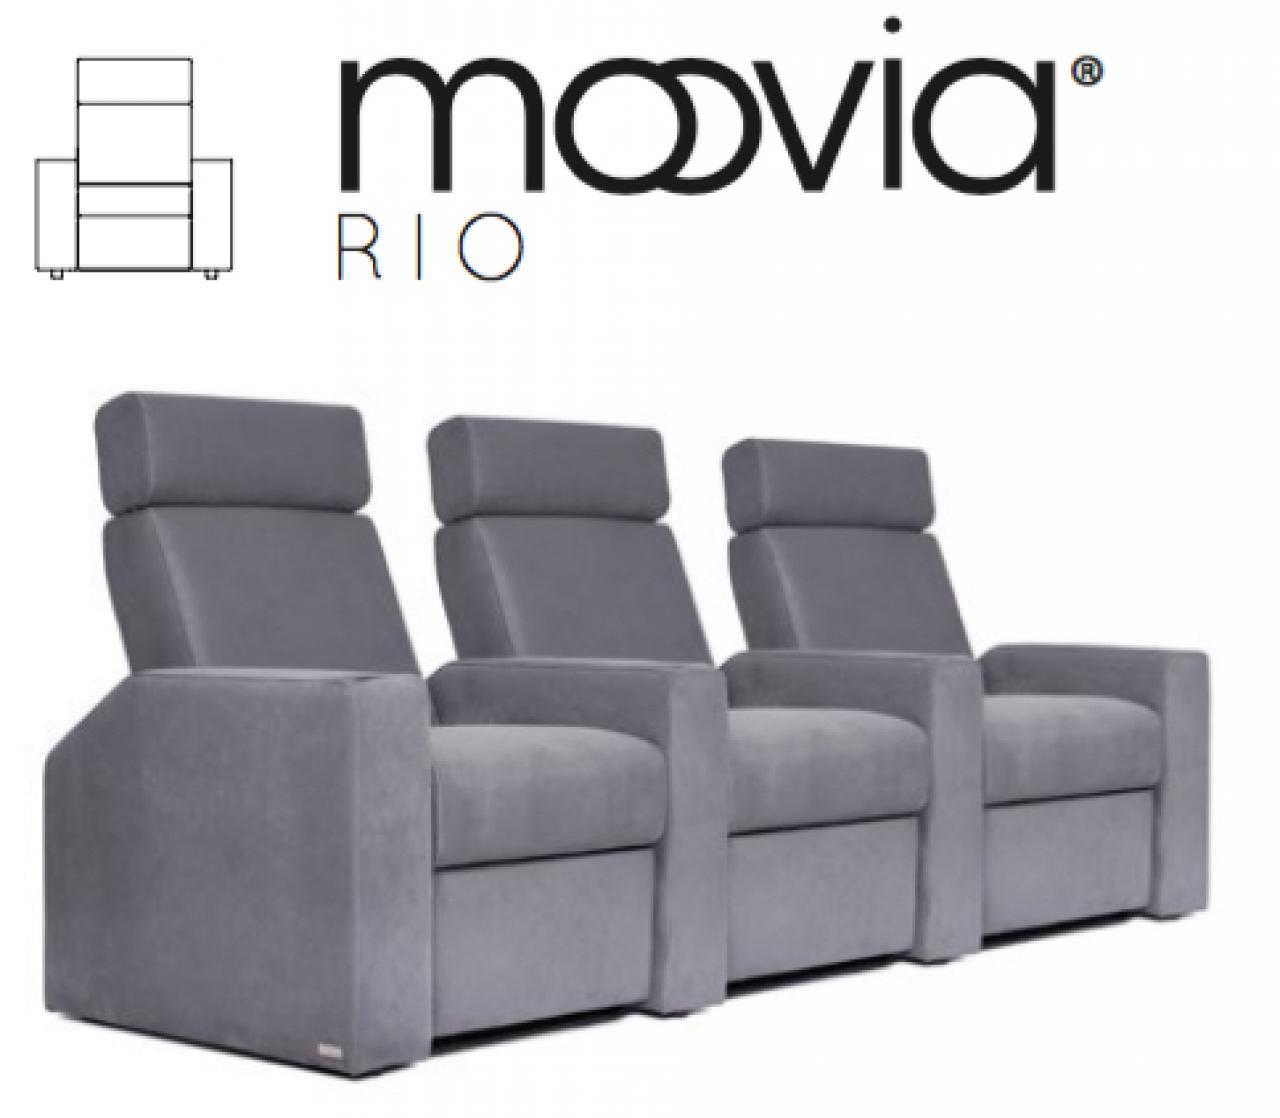 heimkino sofa free trapezsofa grau holz textil himolla luxus heimkino sofas with heimkino sofa. Black Bedroom Furniture Sets. Home Design Ideas